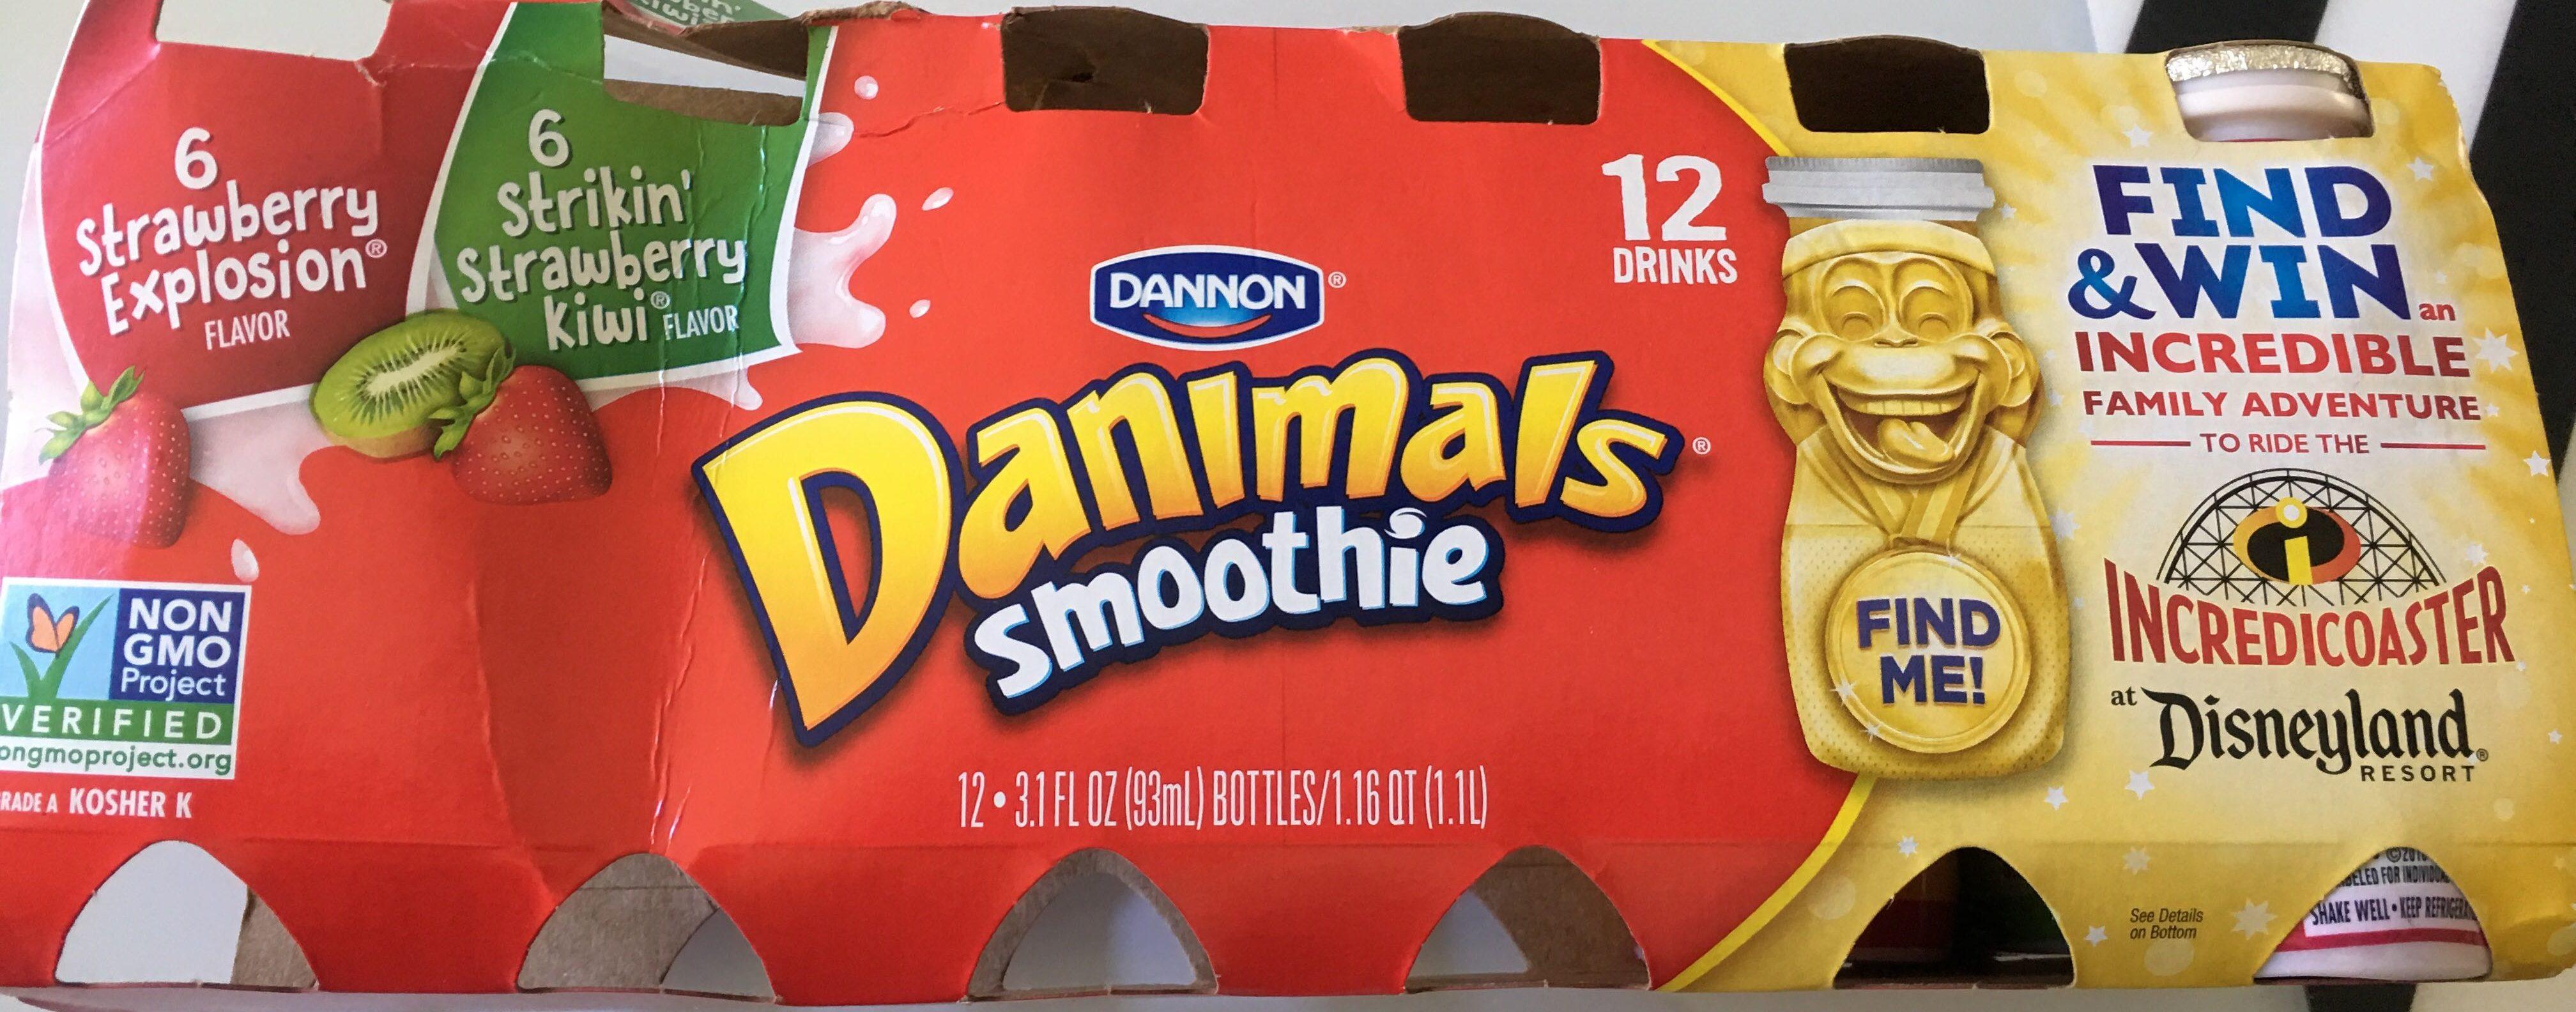 Danimals drink strawberry kiwi - Product - en